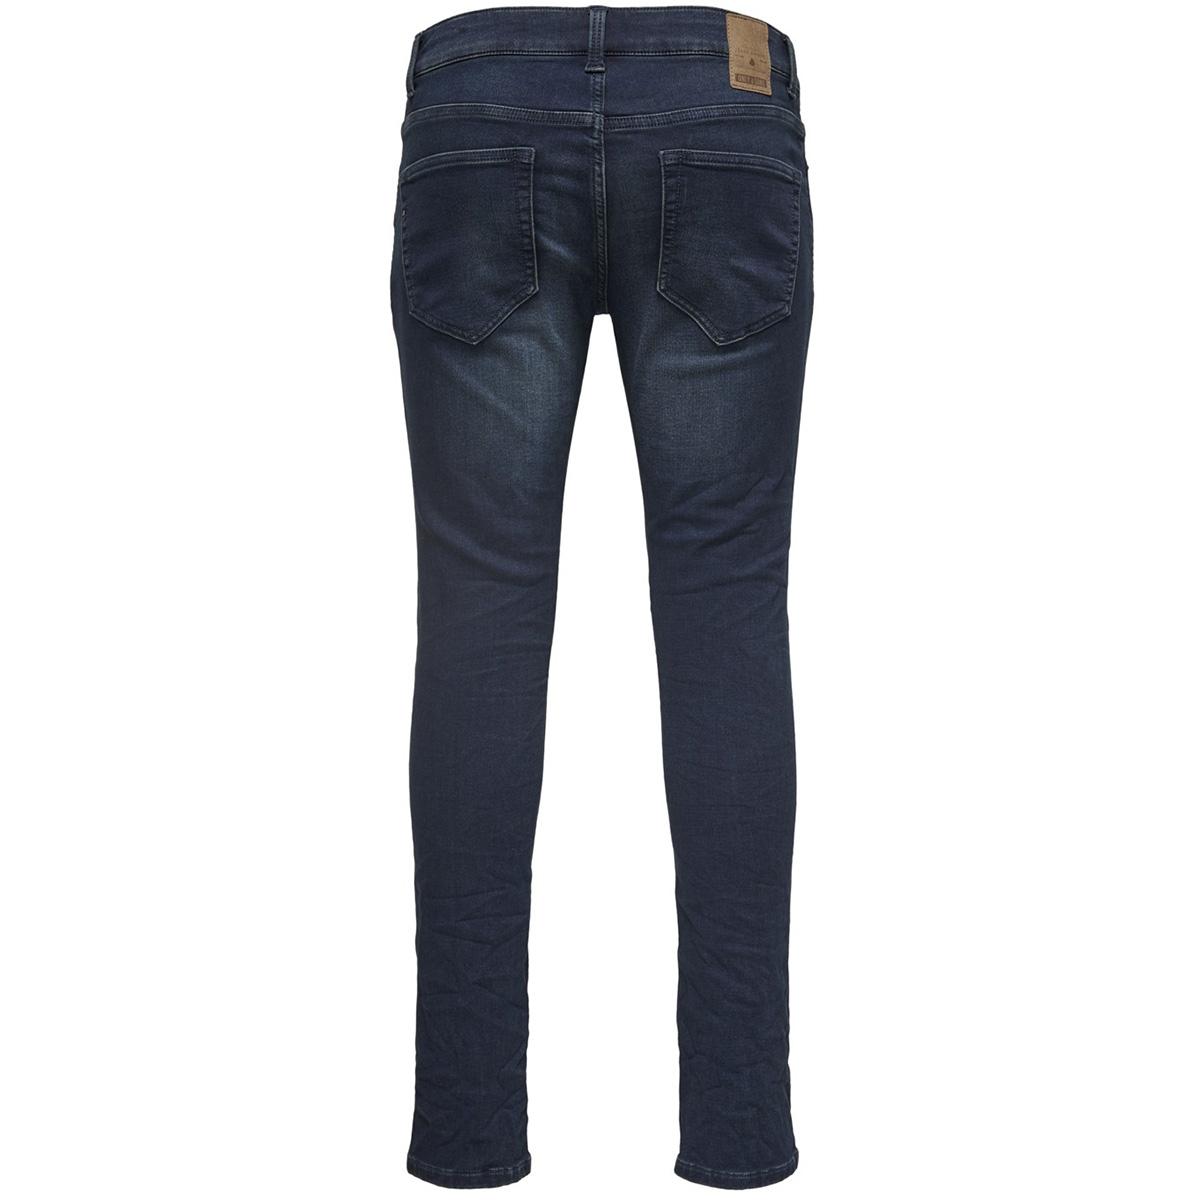 onsloom dark blue sweat pk 3631 noo 22013631 only & sons jeans blue denim